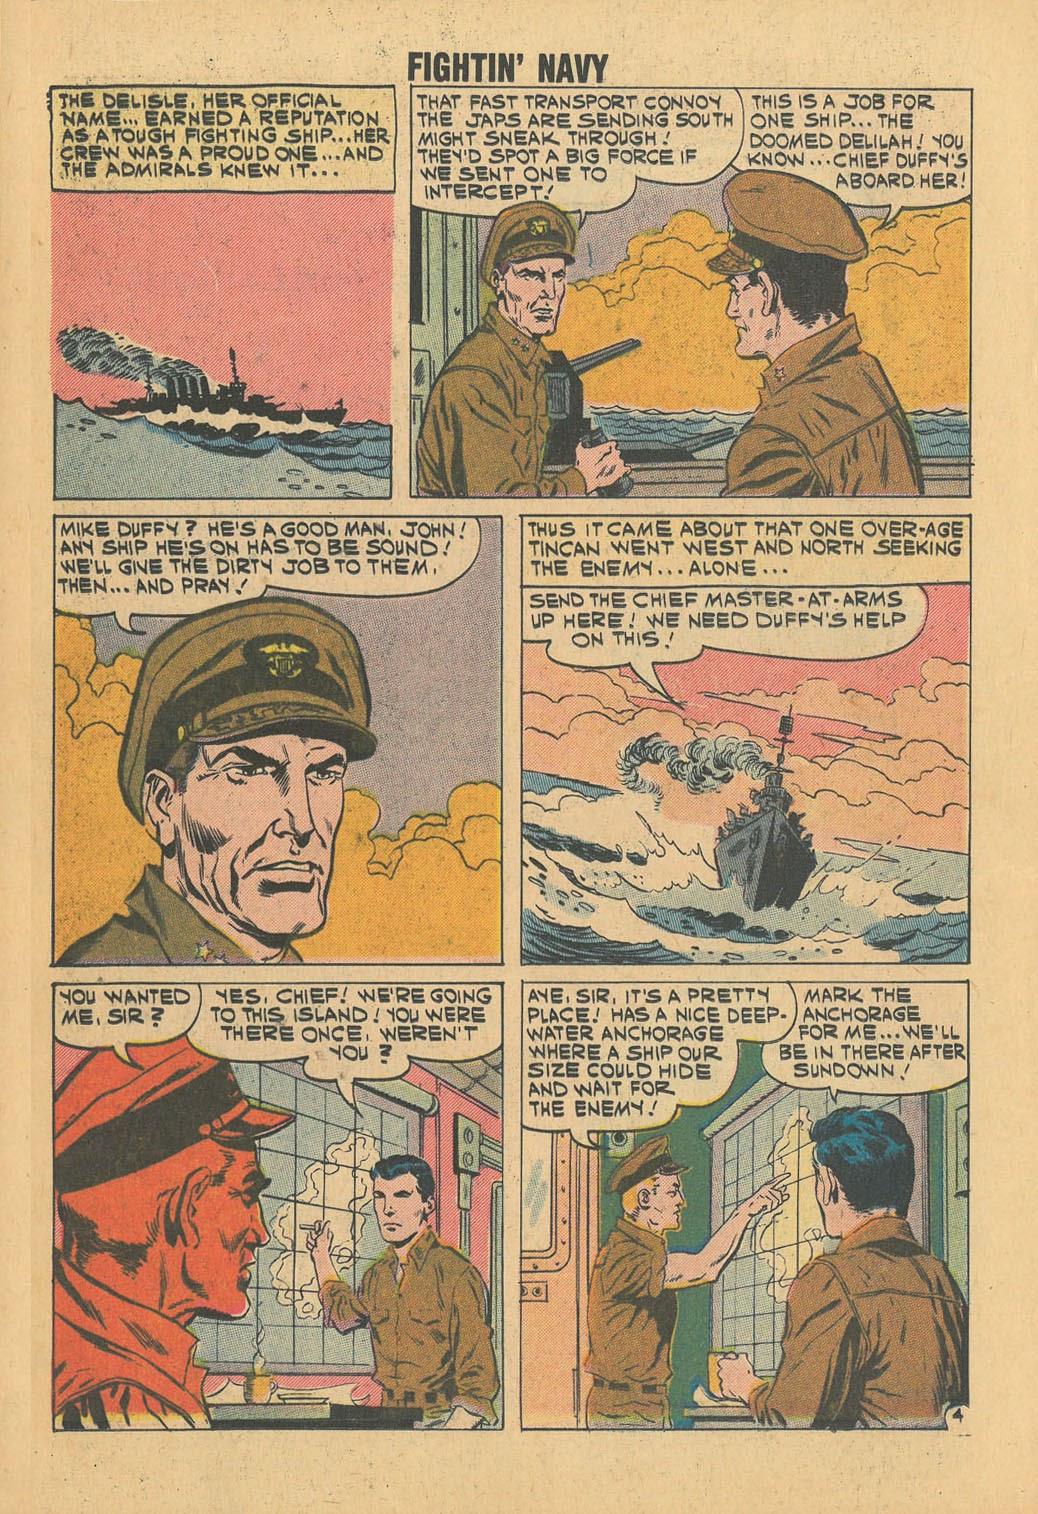 Read online Fightin' Navy comic -  Issue #100 - 16